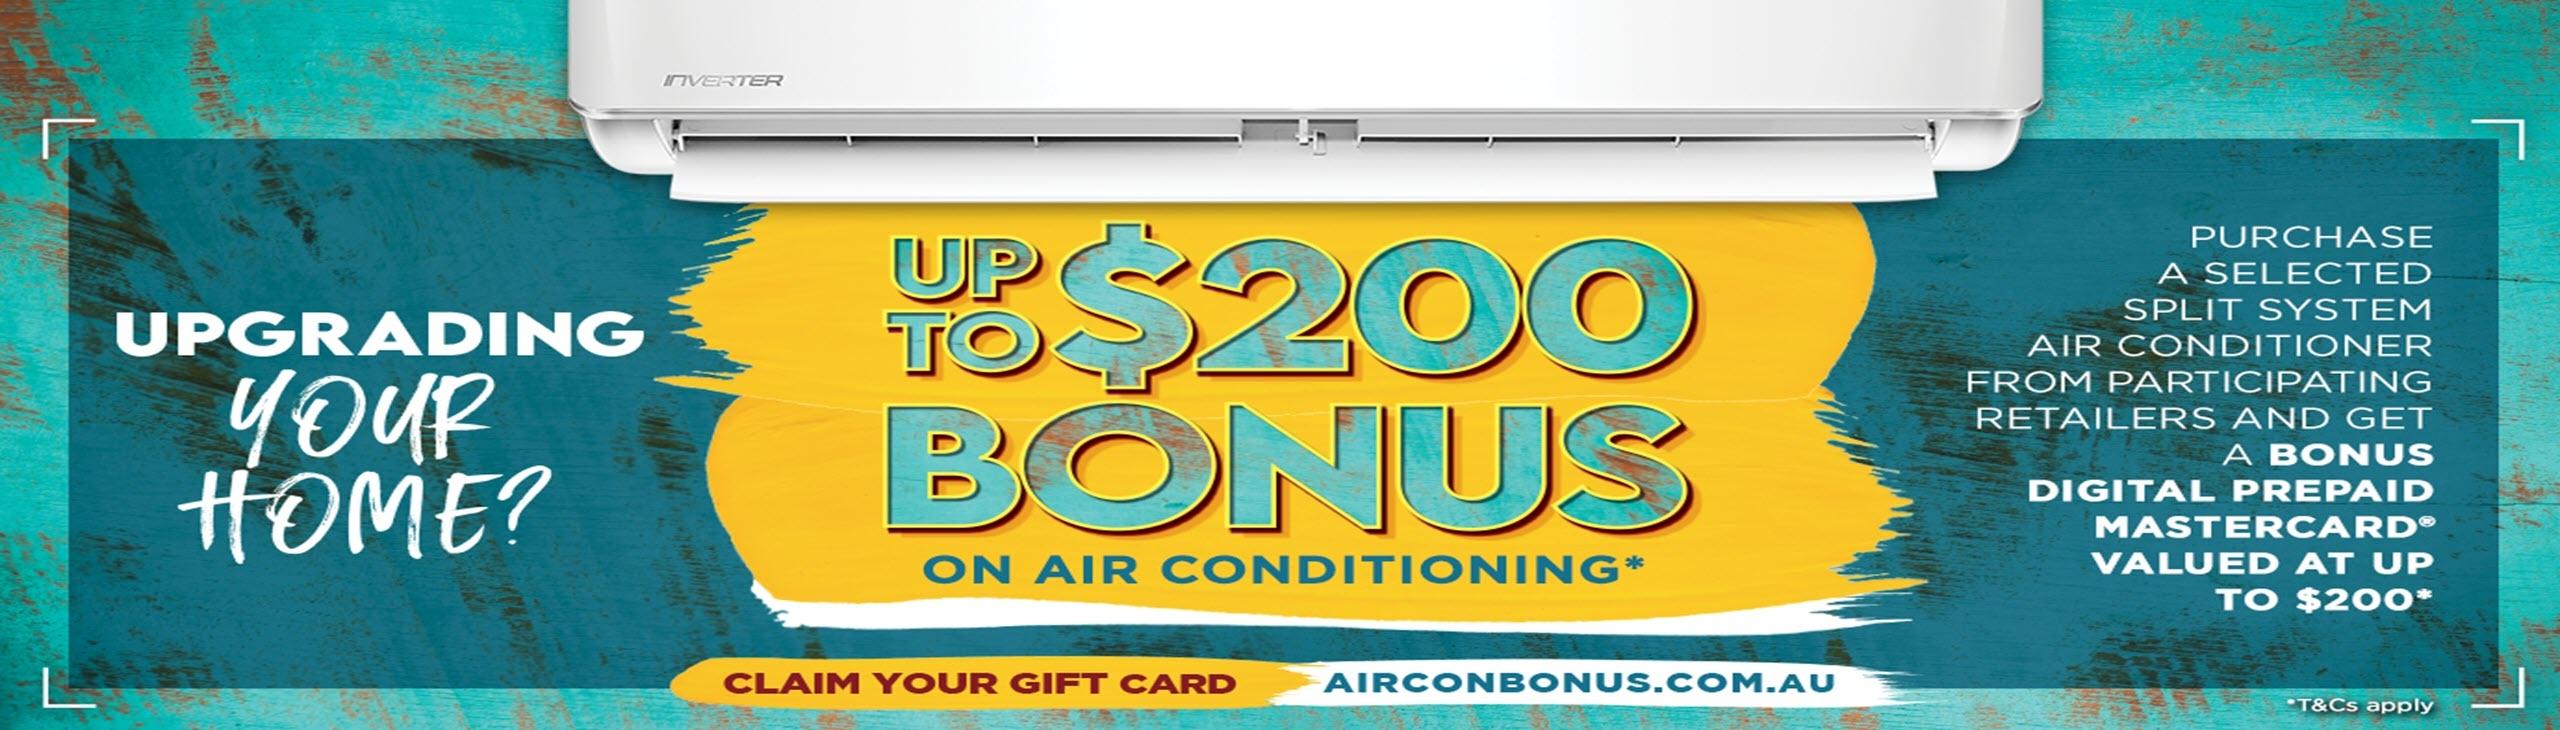 Aircon Gift Card Bonus November 2020